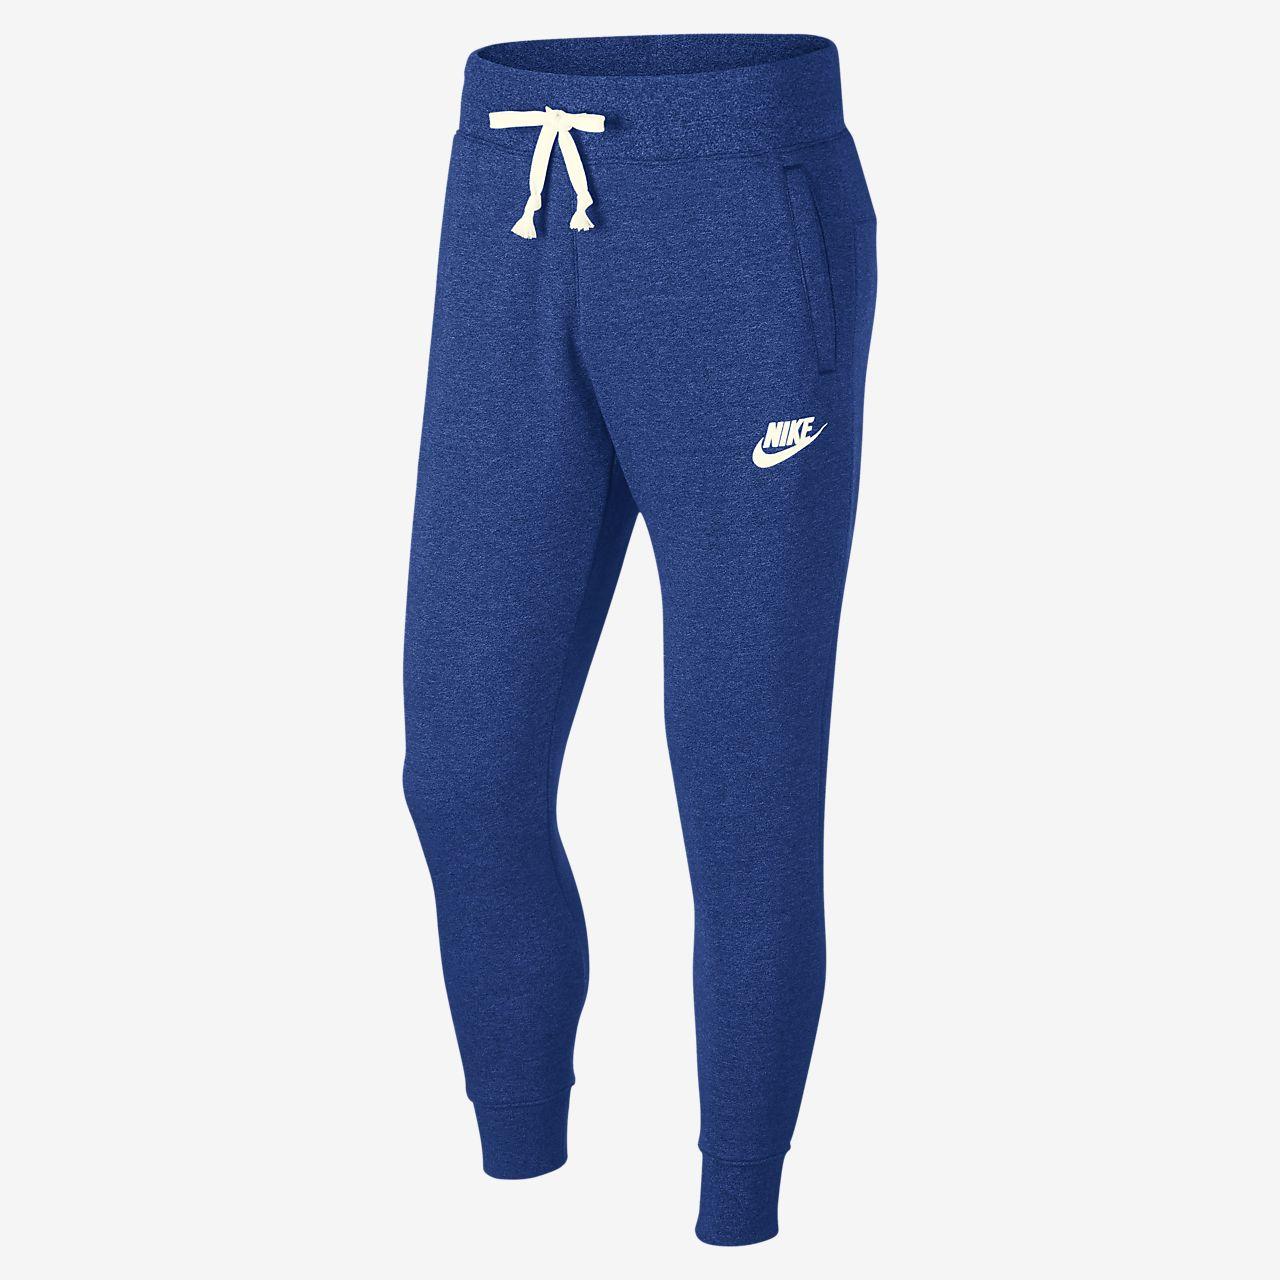 af5aa79765a50c Nike Sportswear Heritage Men s Joggers. Nike.com